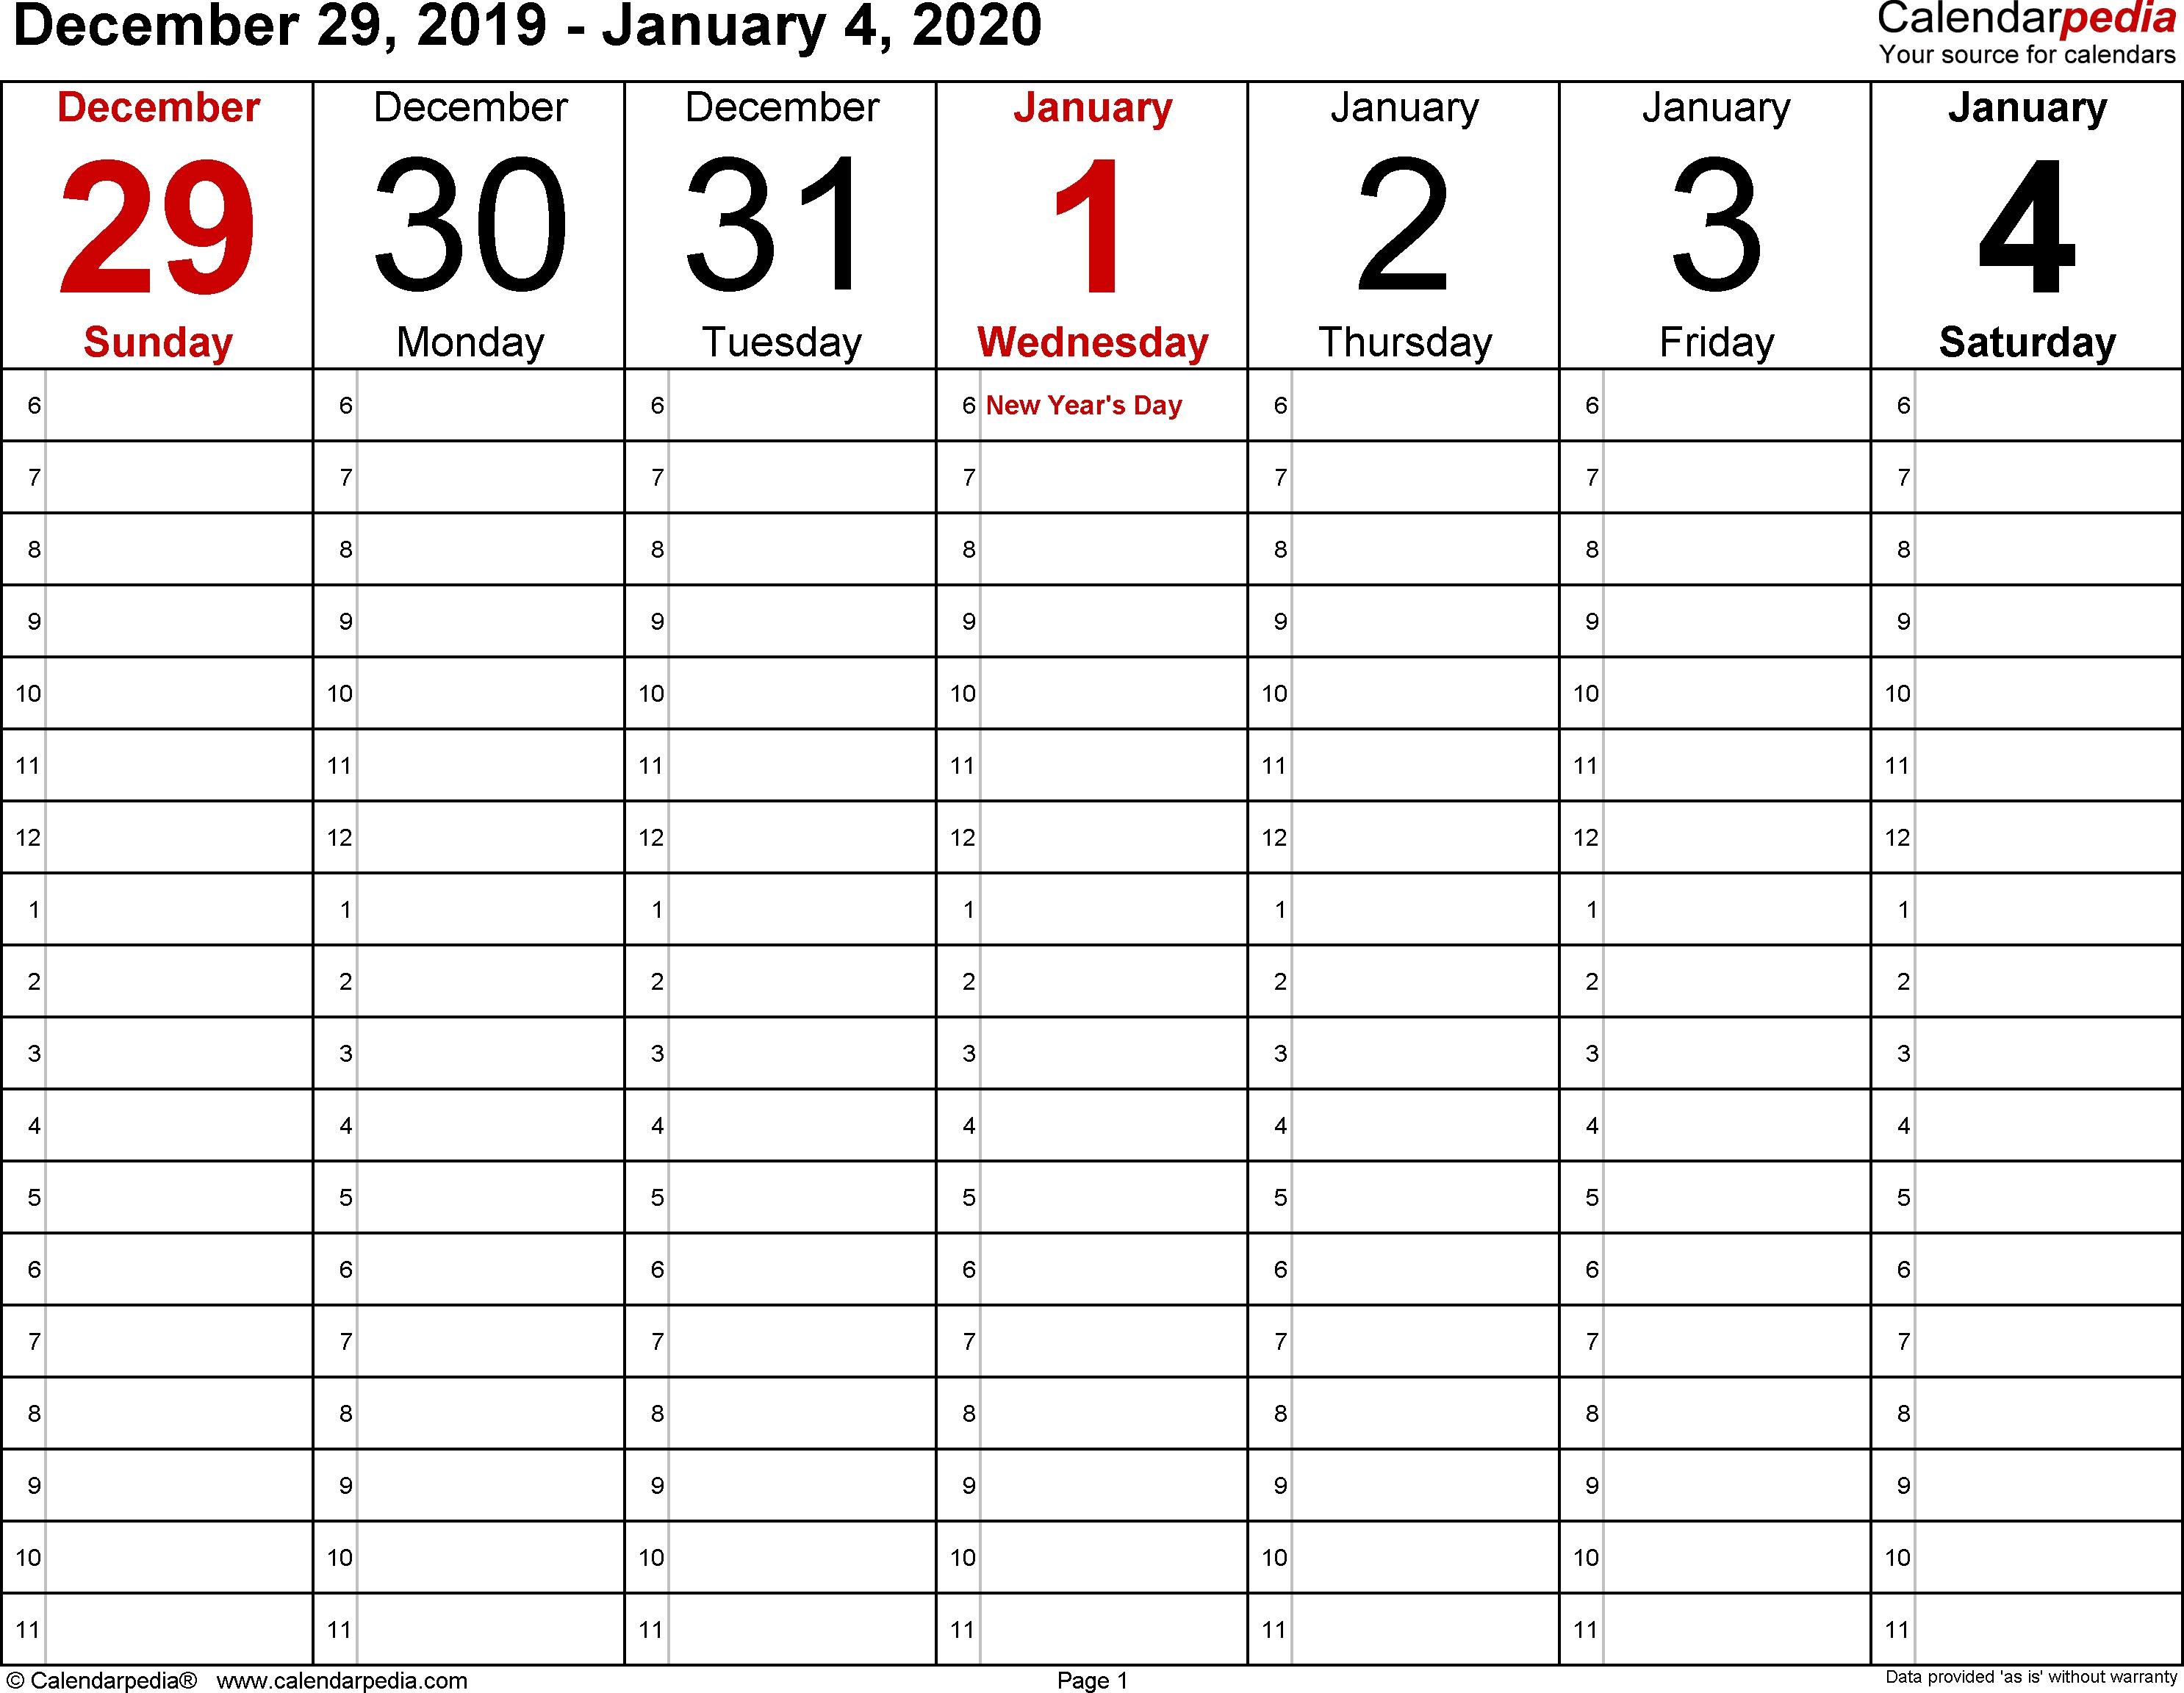 Weekly Calendar 2020 For Word - 12 Free Printable Templates regarding Printable 8.5 X 11 2020 Calendar